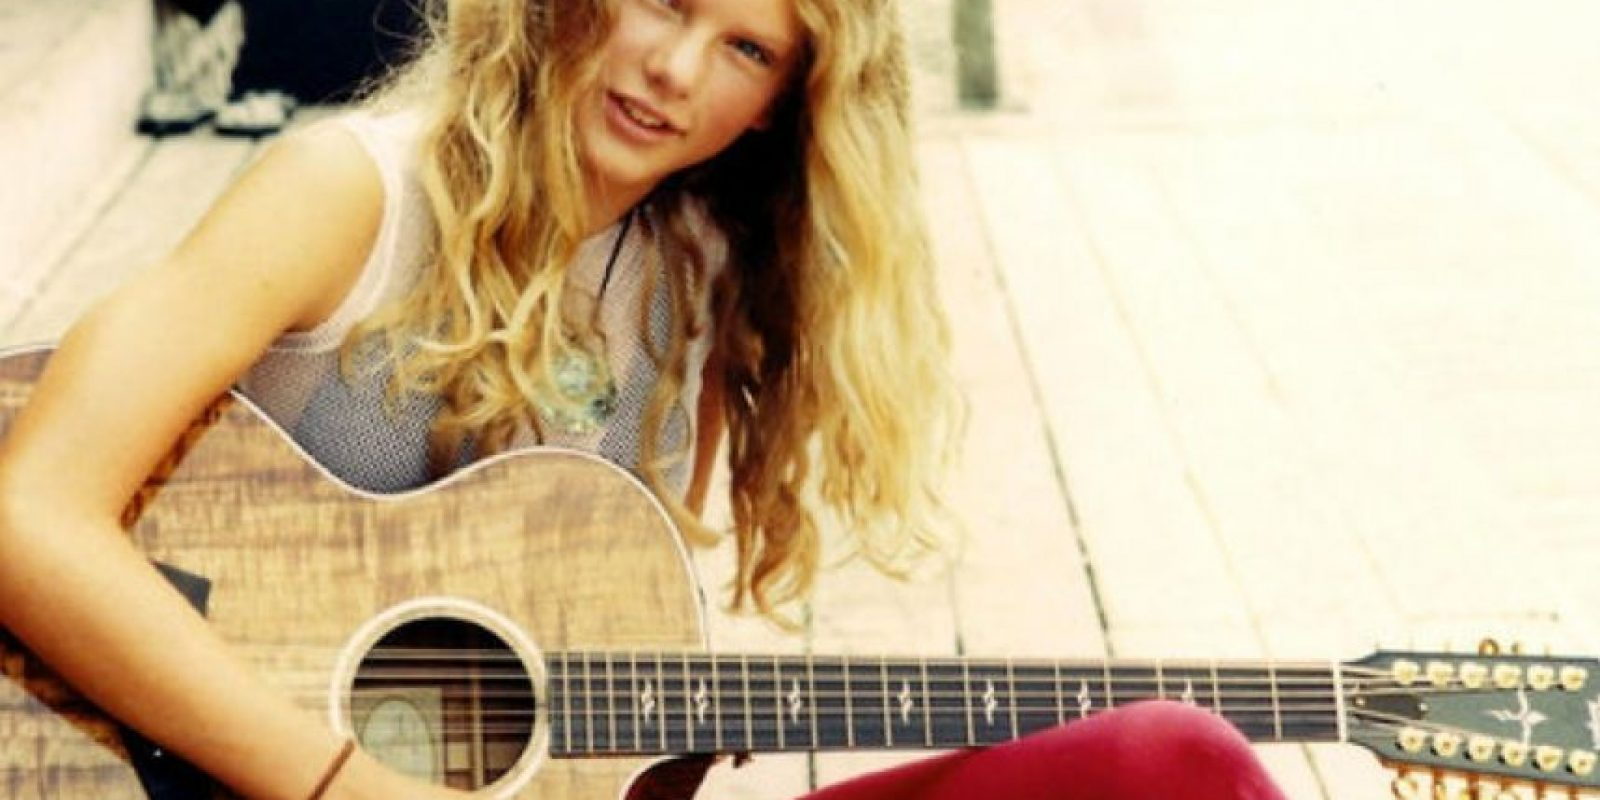 Taylor Swift Foto:Vía HollywoodLife.com